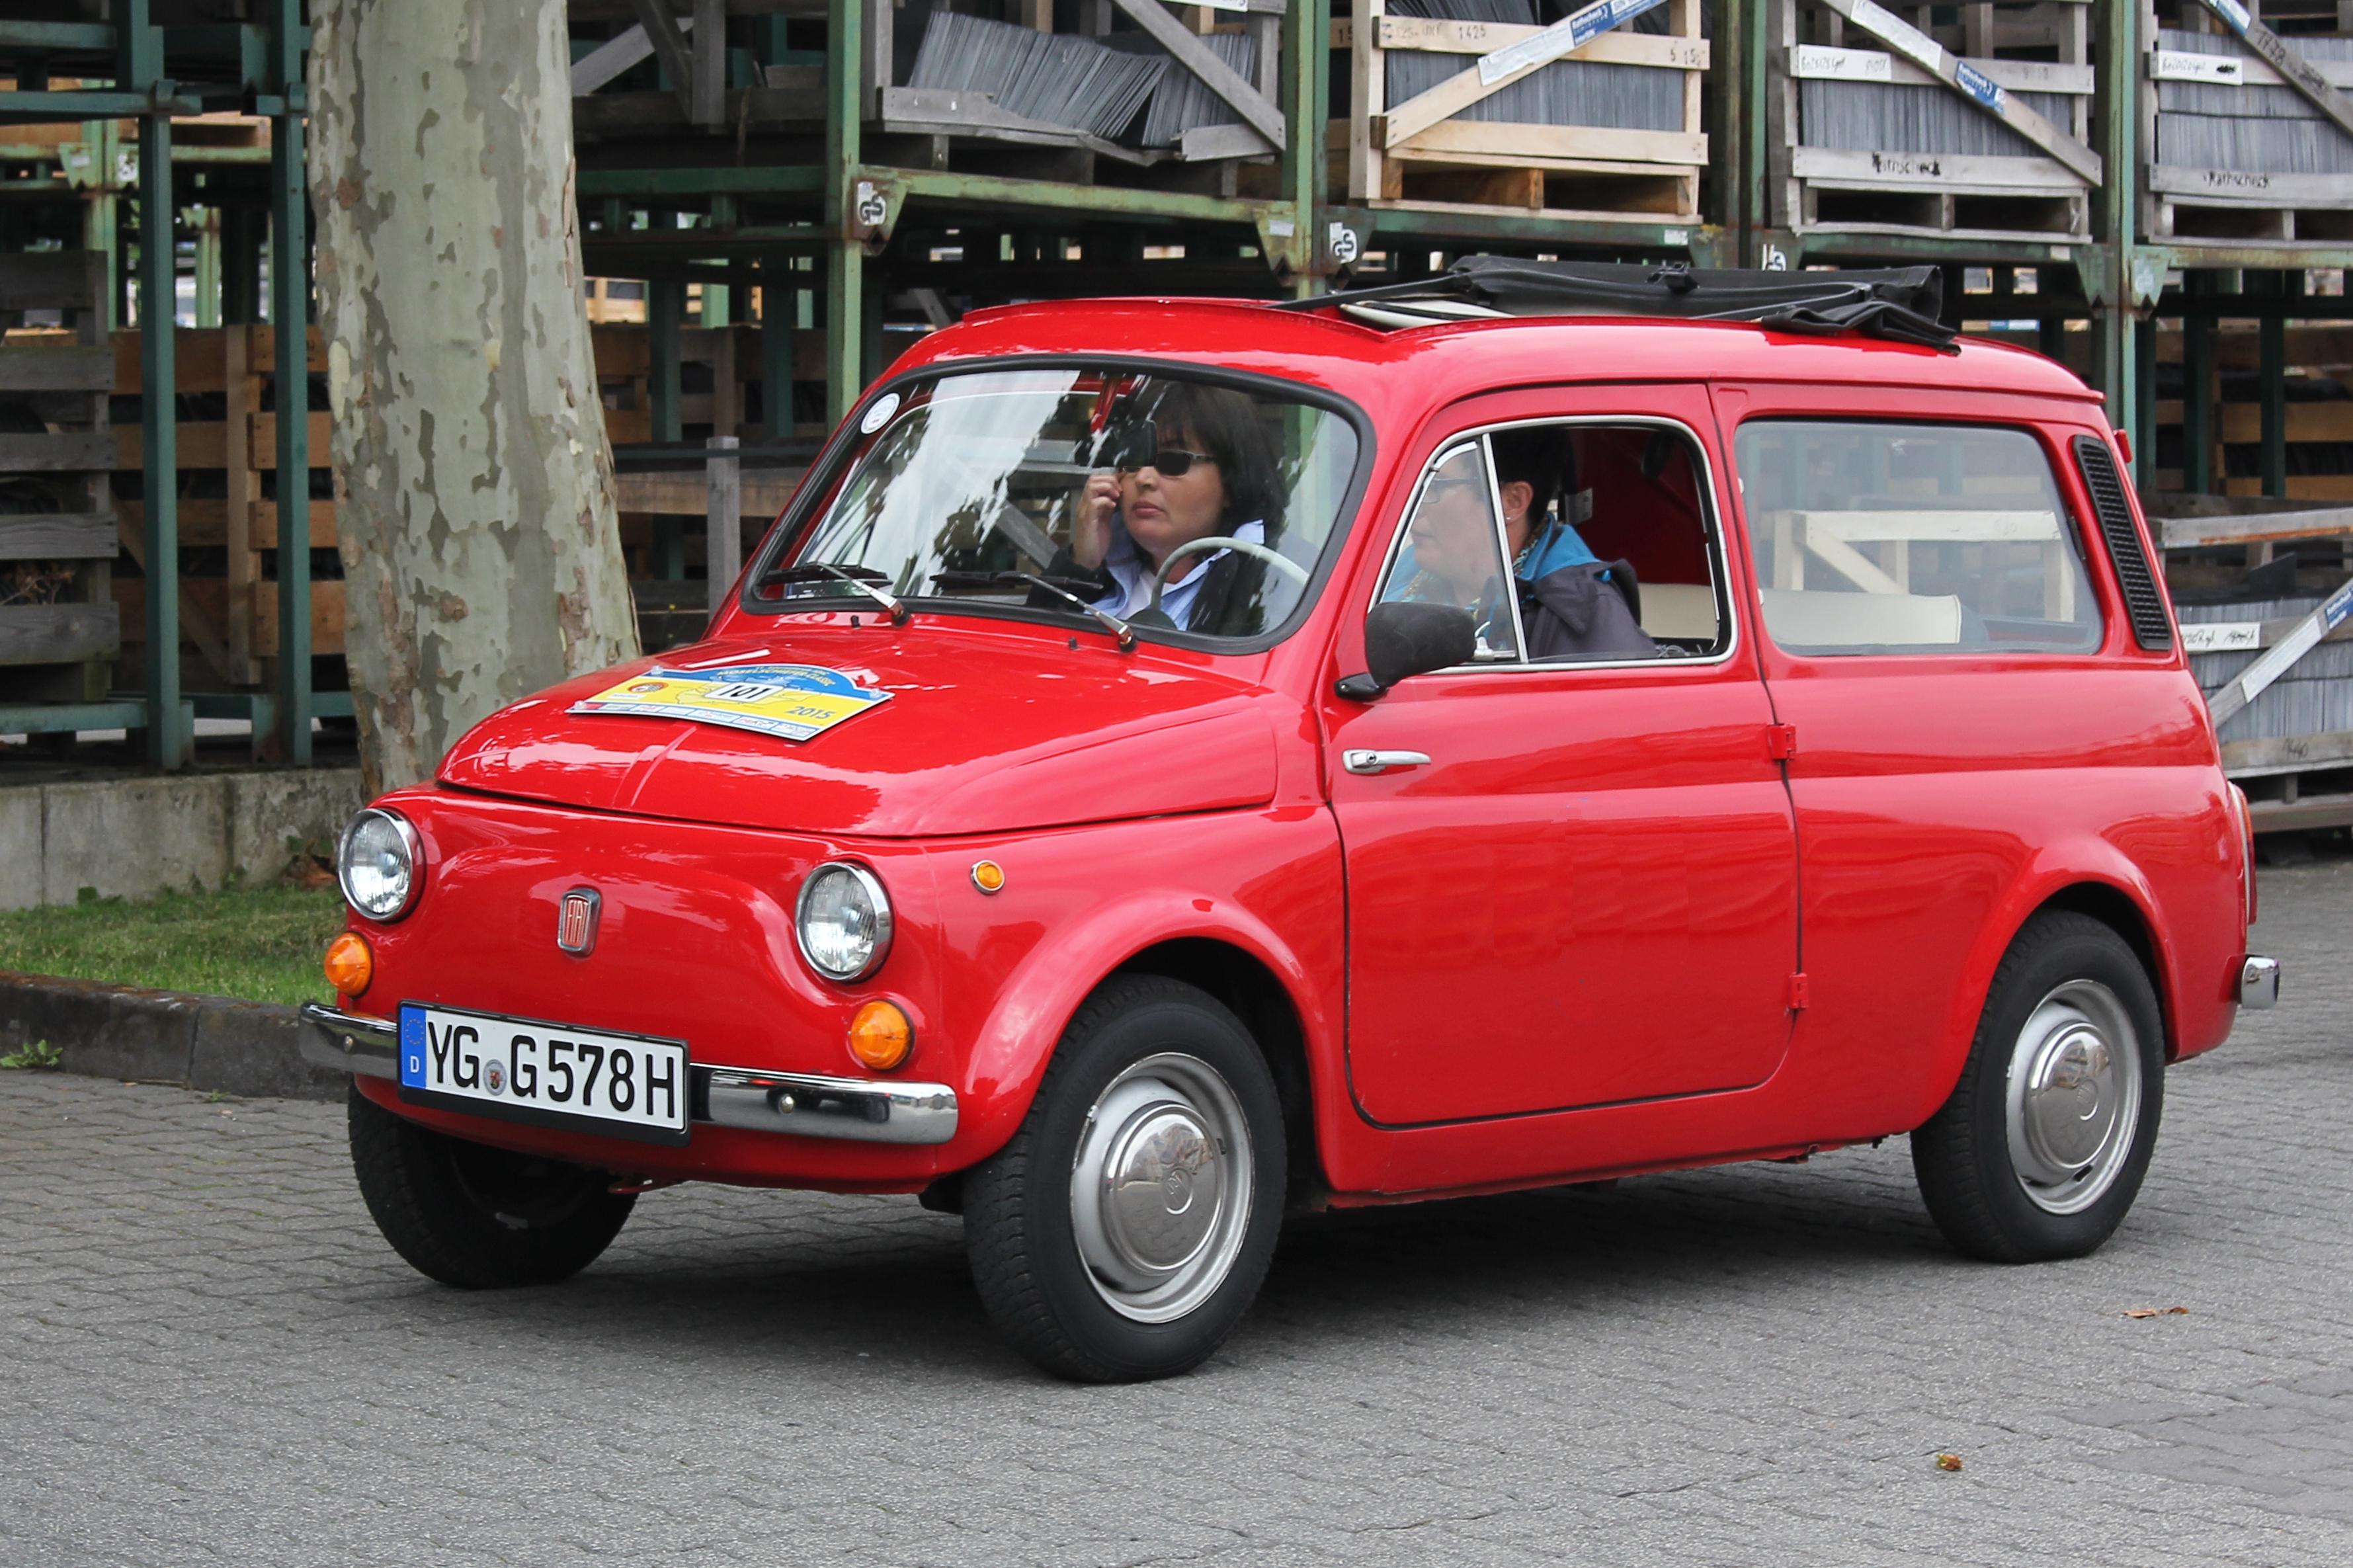 Pictureonly additionally File Fiat 500 Giardiniera  Bj  1978  2015 09 12 3766 b besides Seat 1400 B Especial1956 1957 Una Larga Espera together with Citroen Cx 25 Prestige Turbo 1985 1986 also Seicento. on fiat 500 for sale